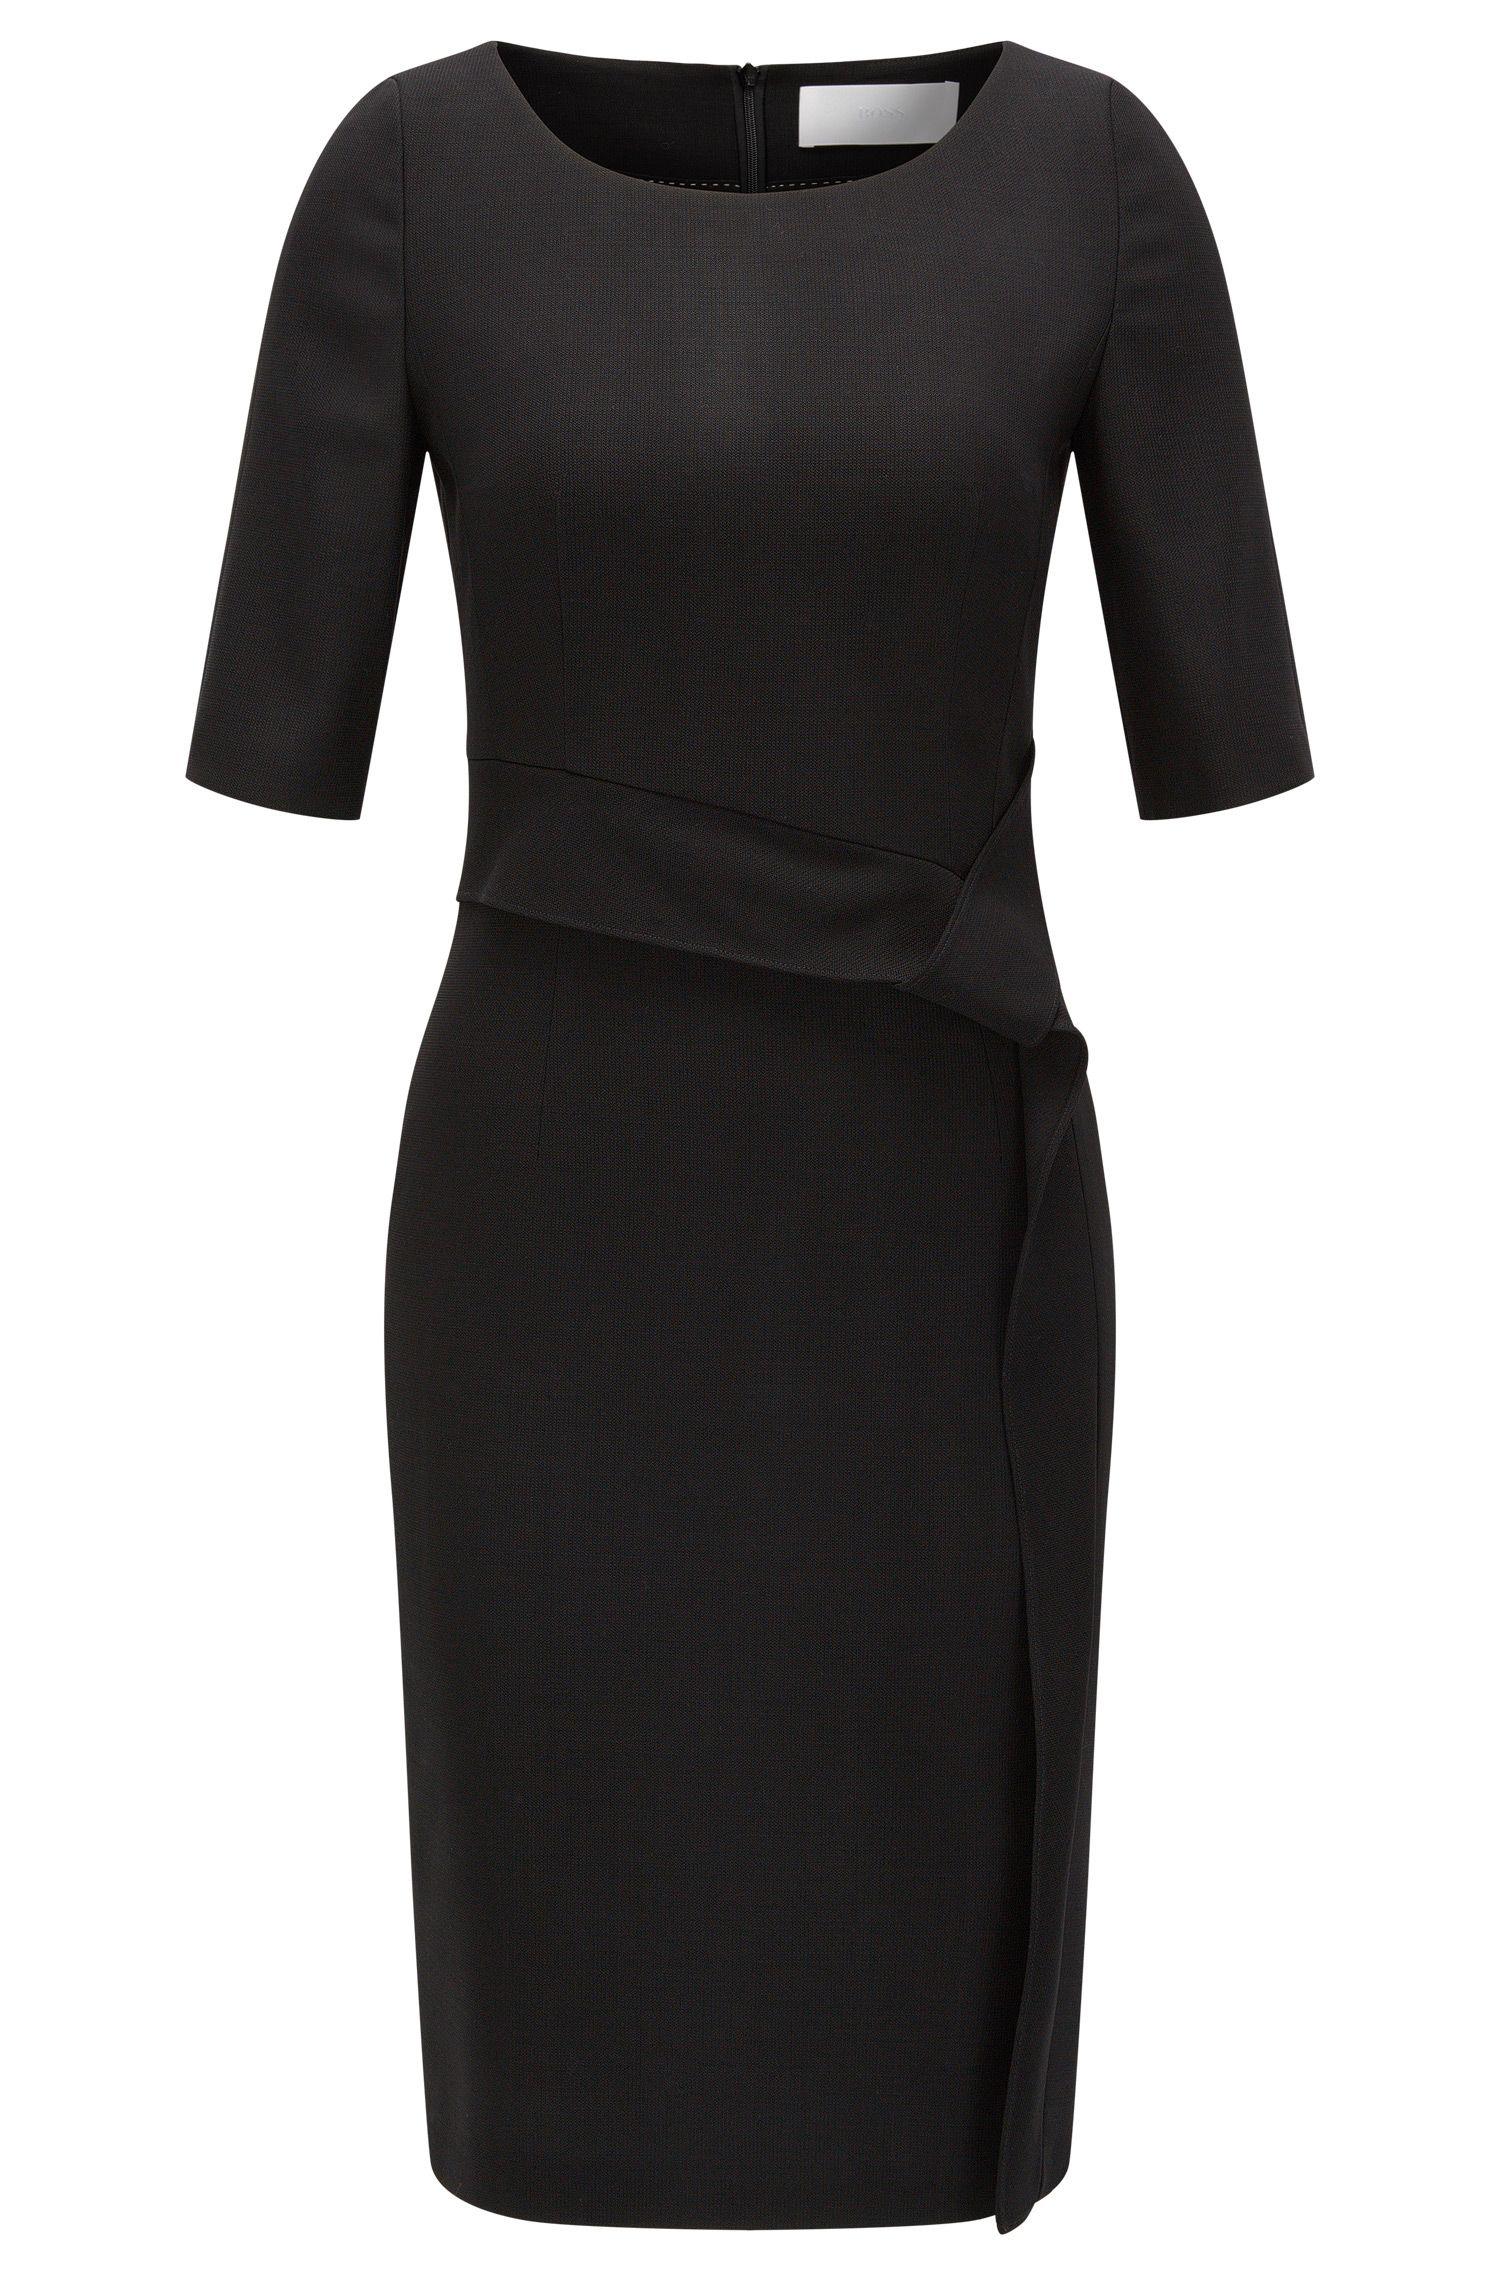 Virgin Wool Blend Asymmetrical Sheath Dress | Delera, Black